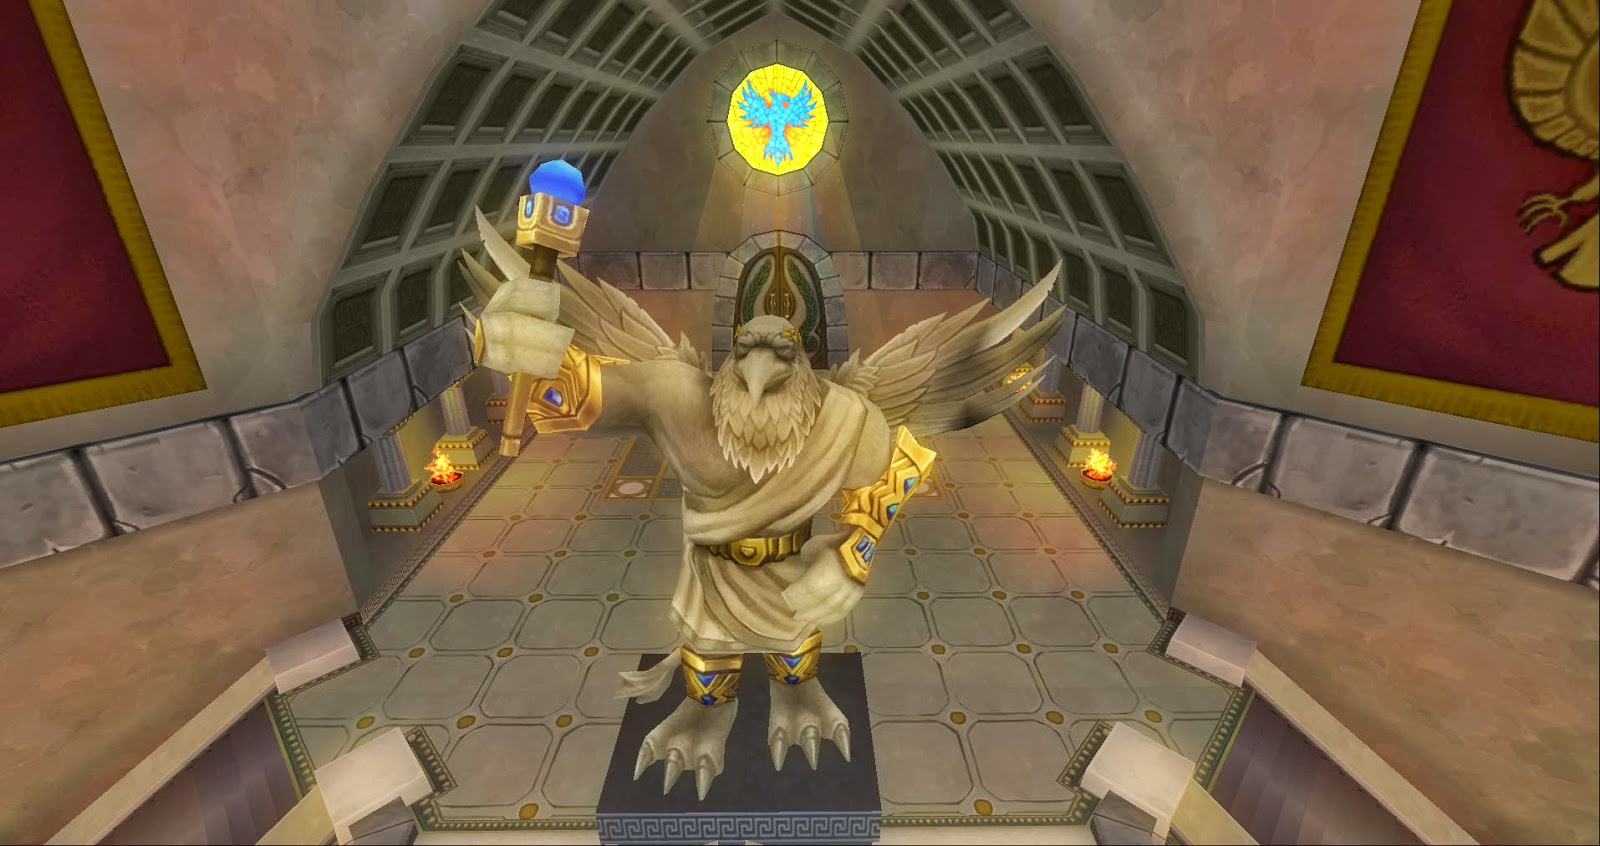 The Friendly Necromancer: Doing the Aquila -- RAFFLE!